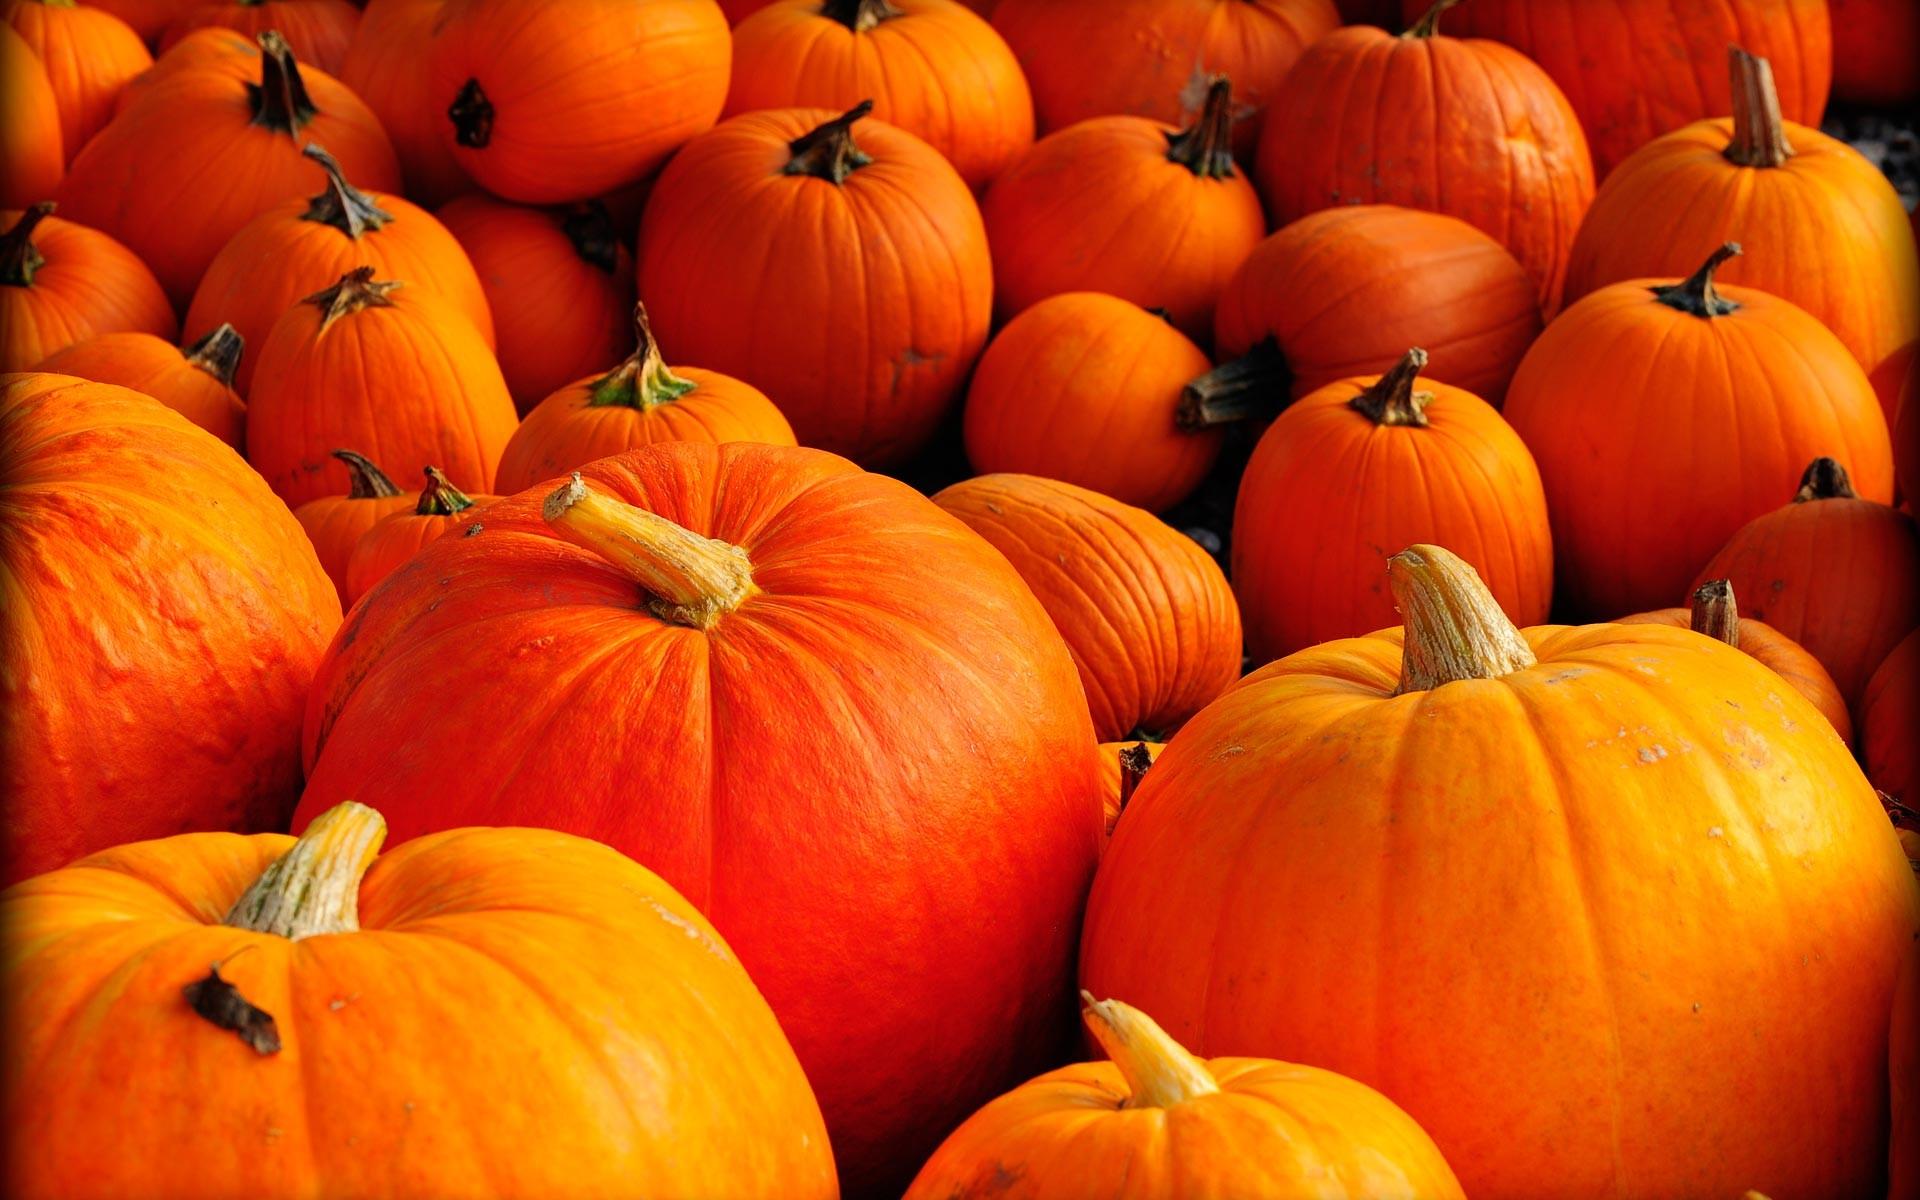 Pumpkin Wallpaper Backgrounds 57 Pictures